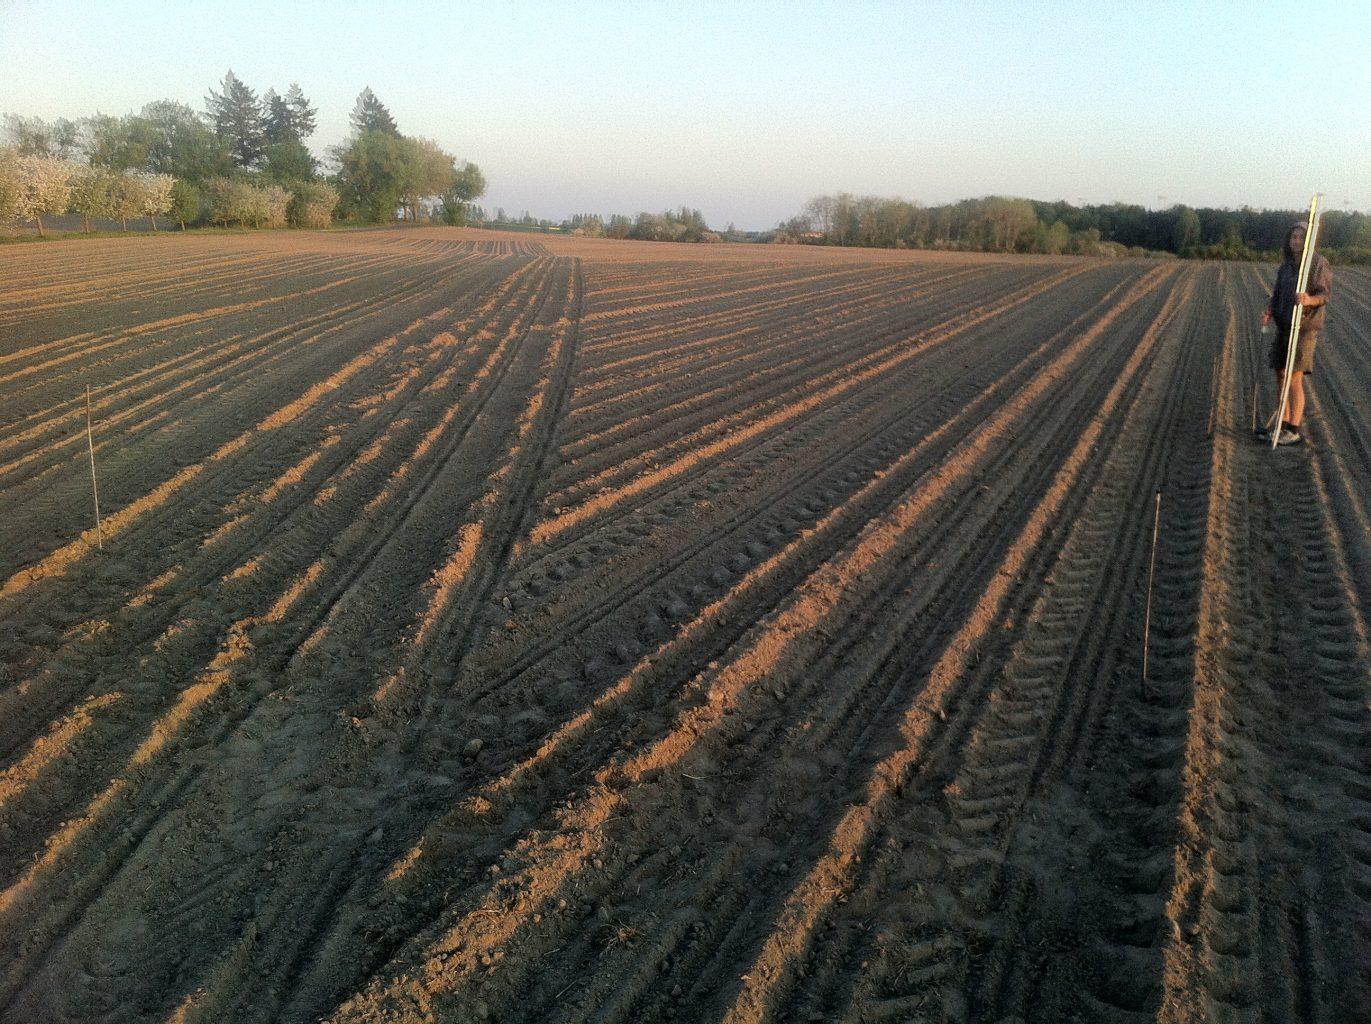 Original position of Acre in the corn field